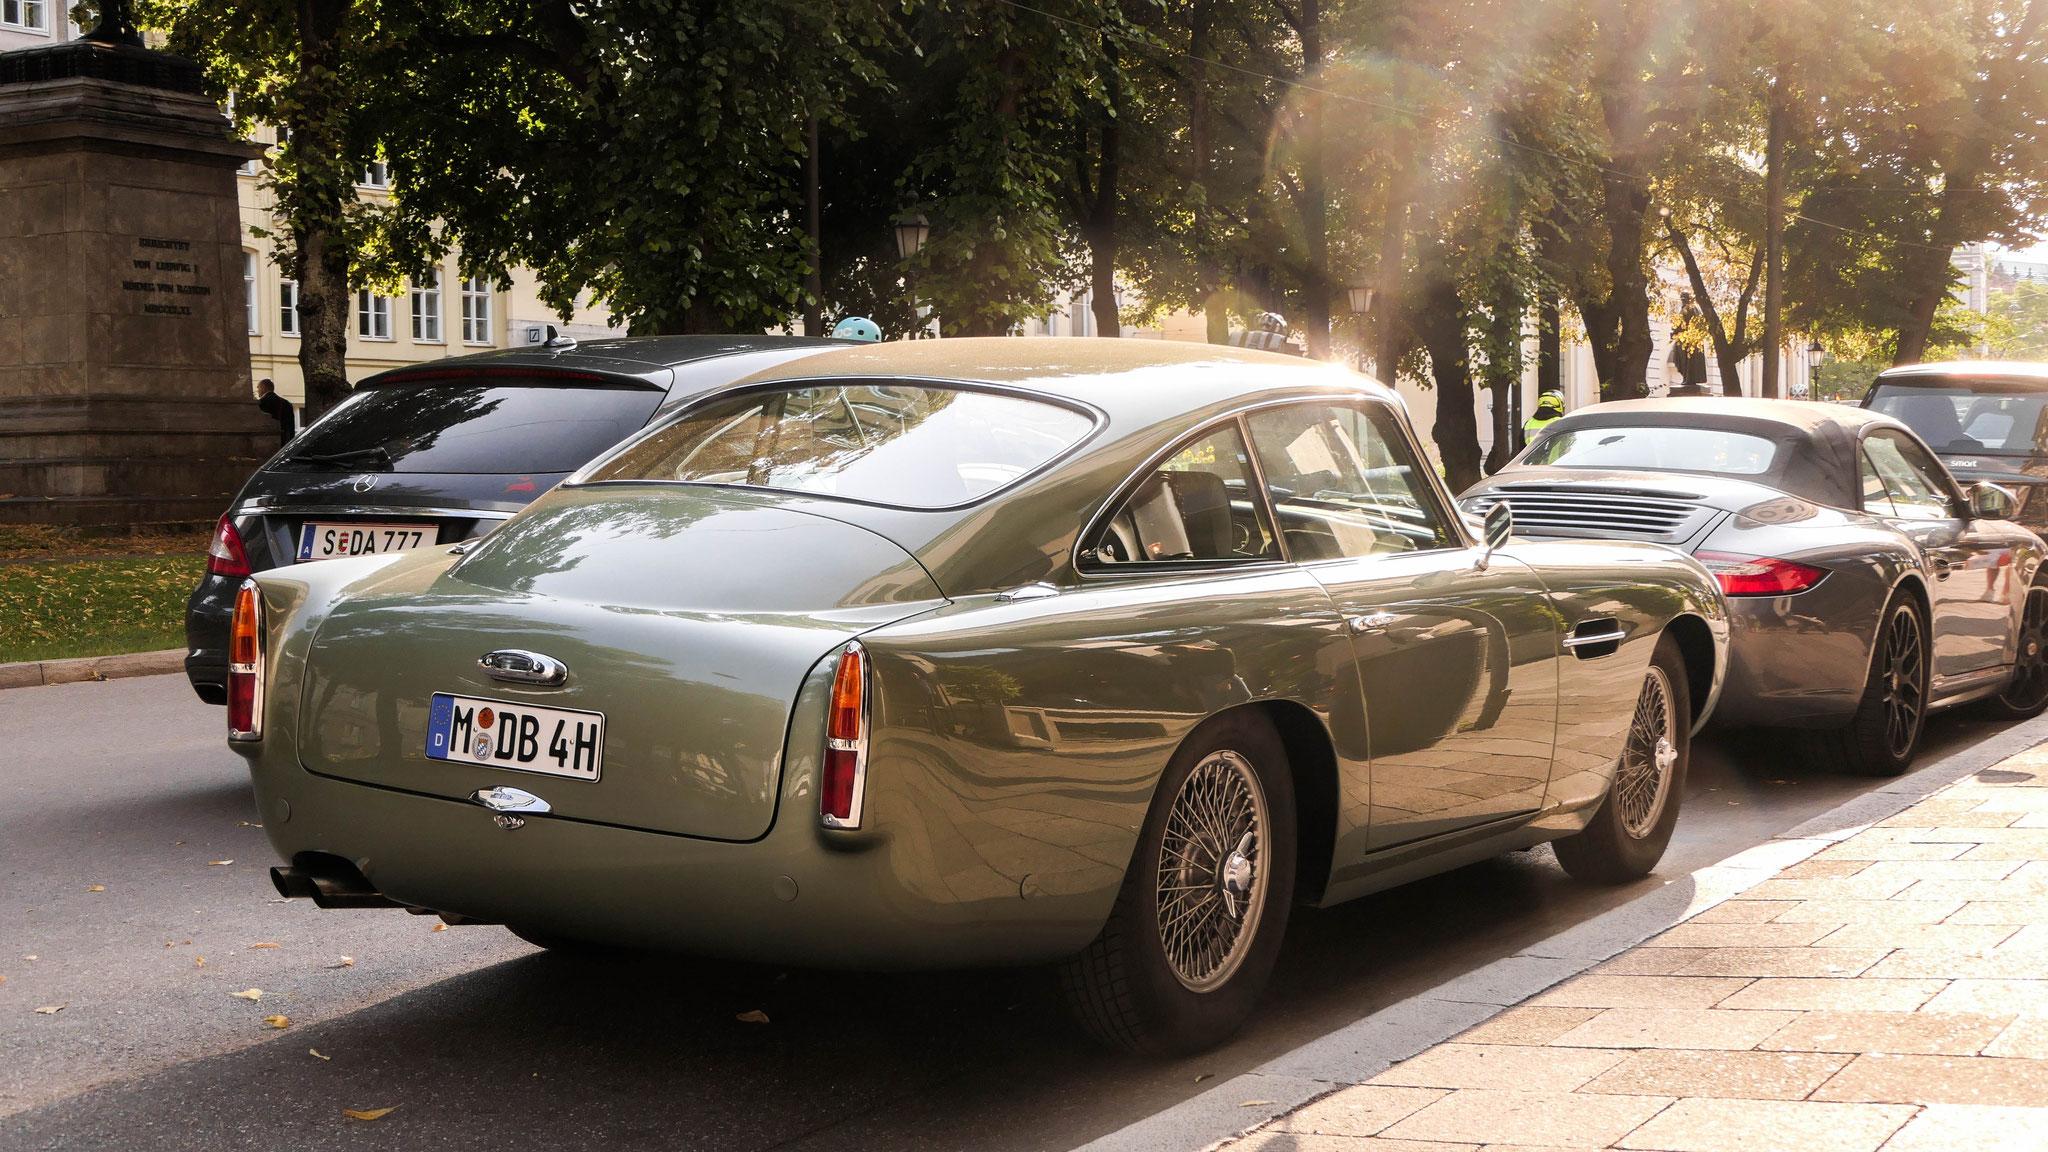 Aston Martin DB4 - M-DB-4H